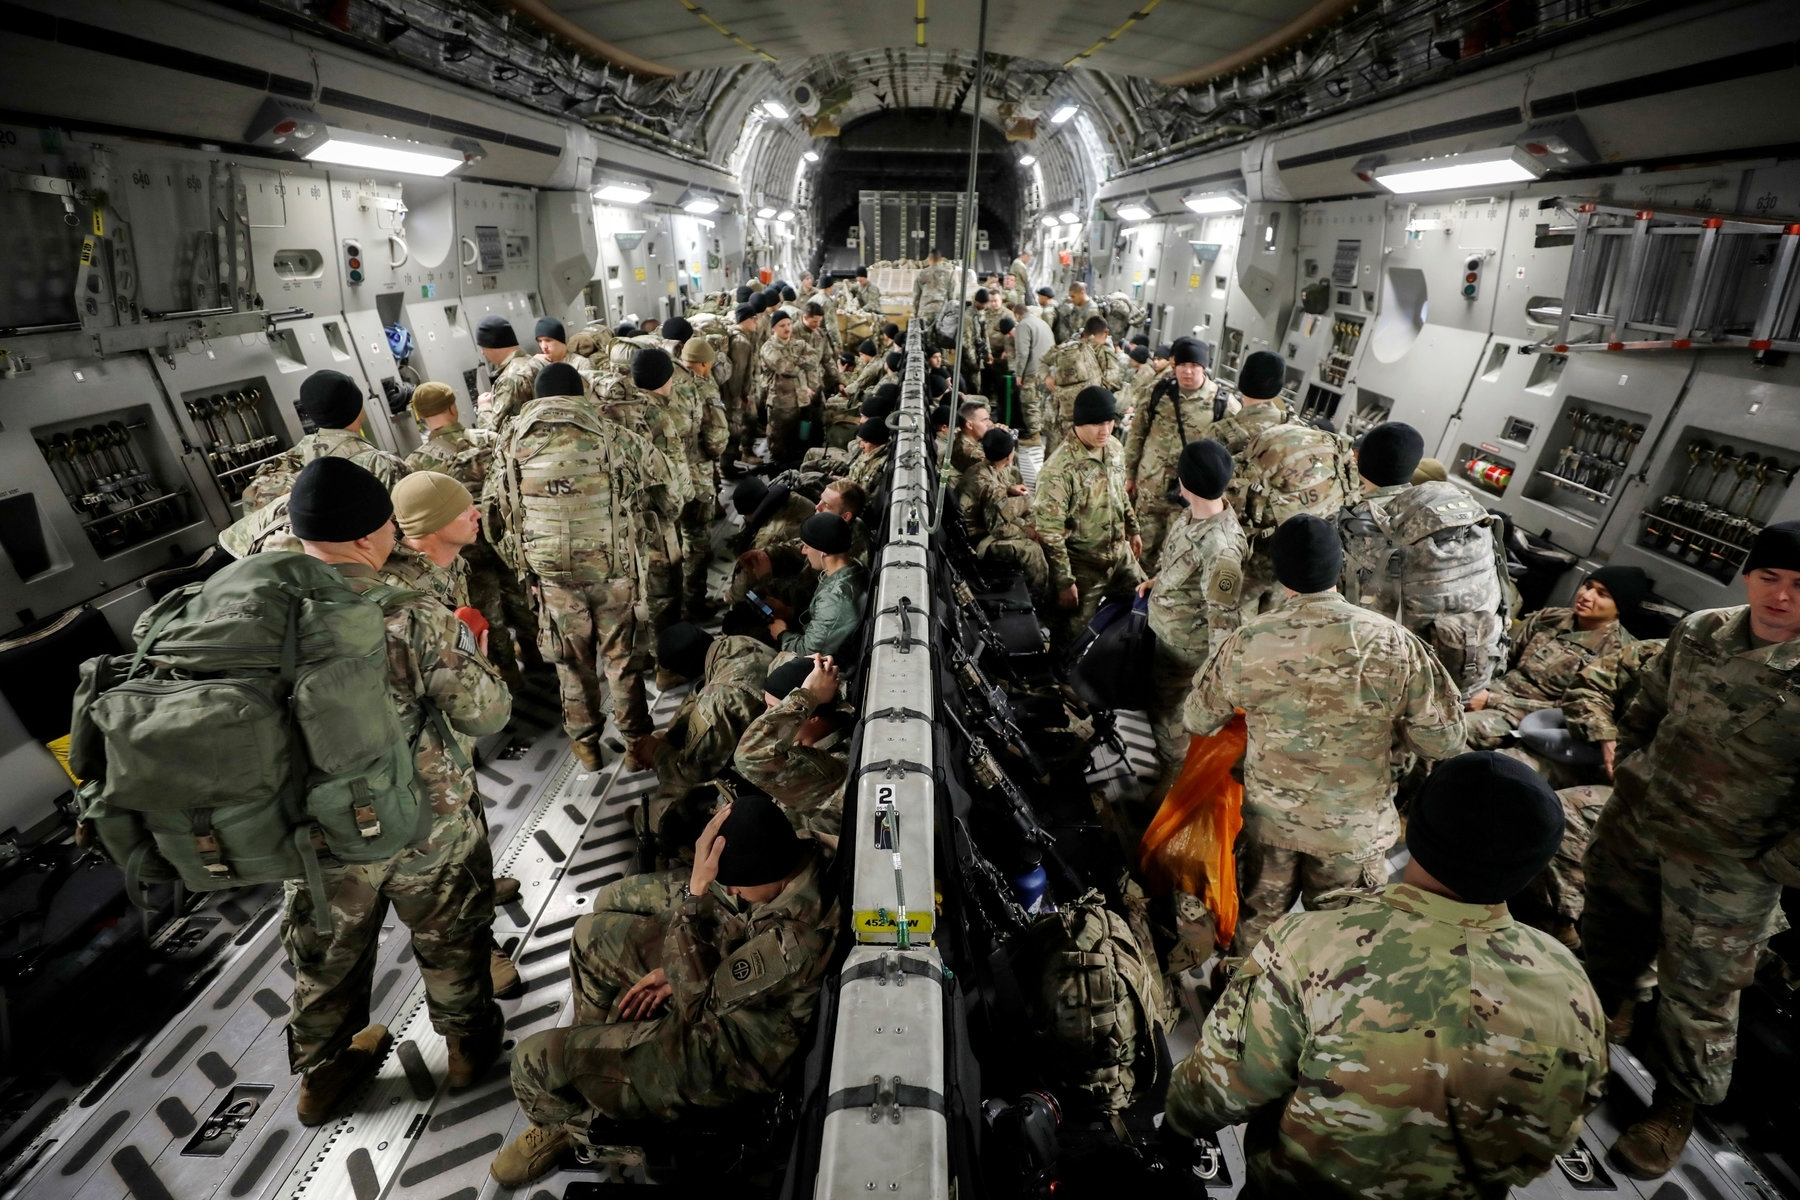 U.s. Army Halts Training Over Coronavirus But Then Changes